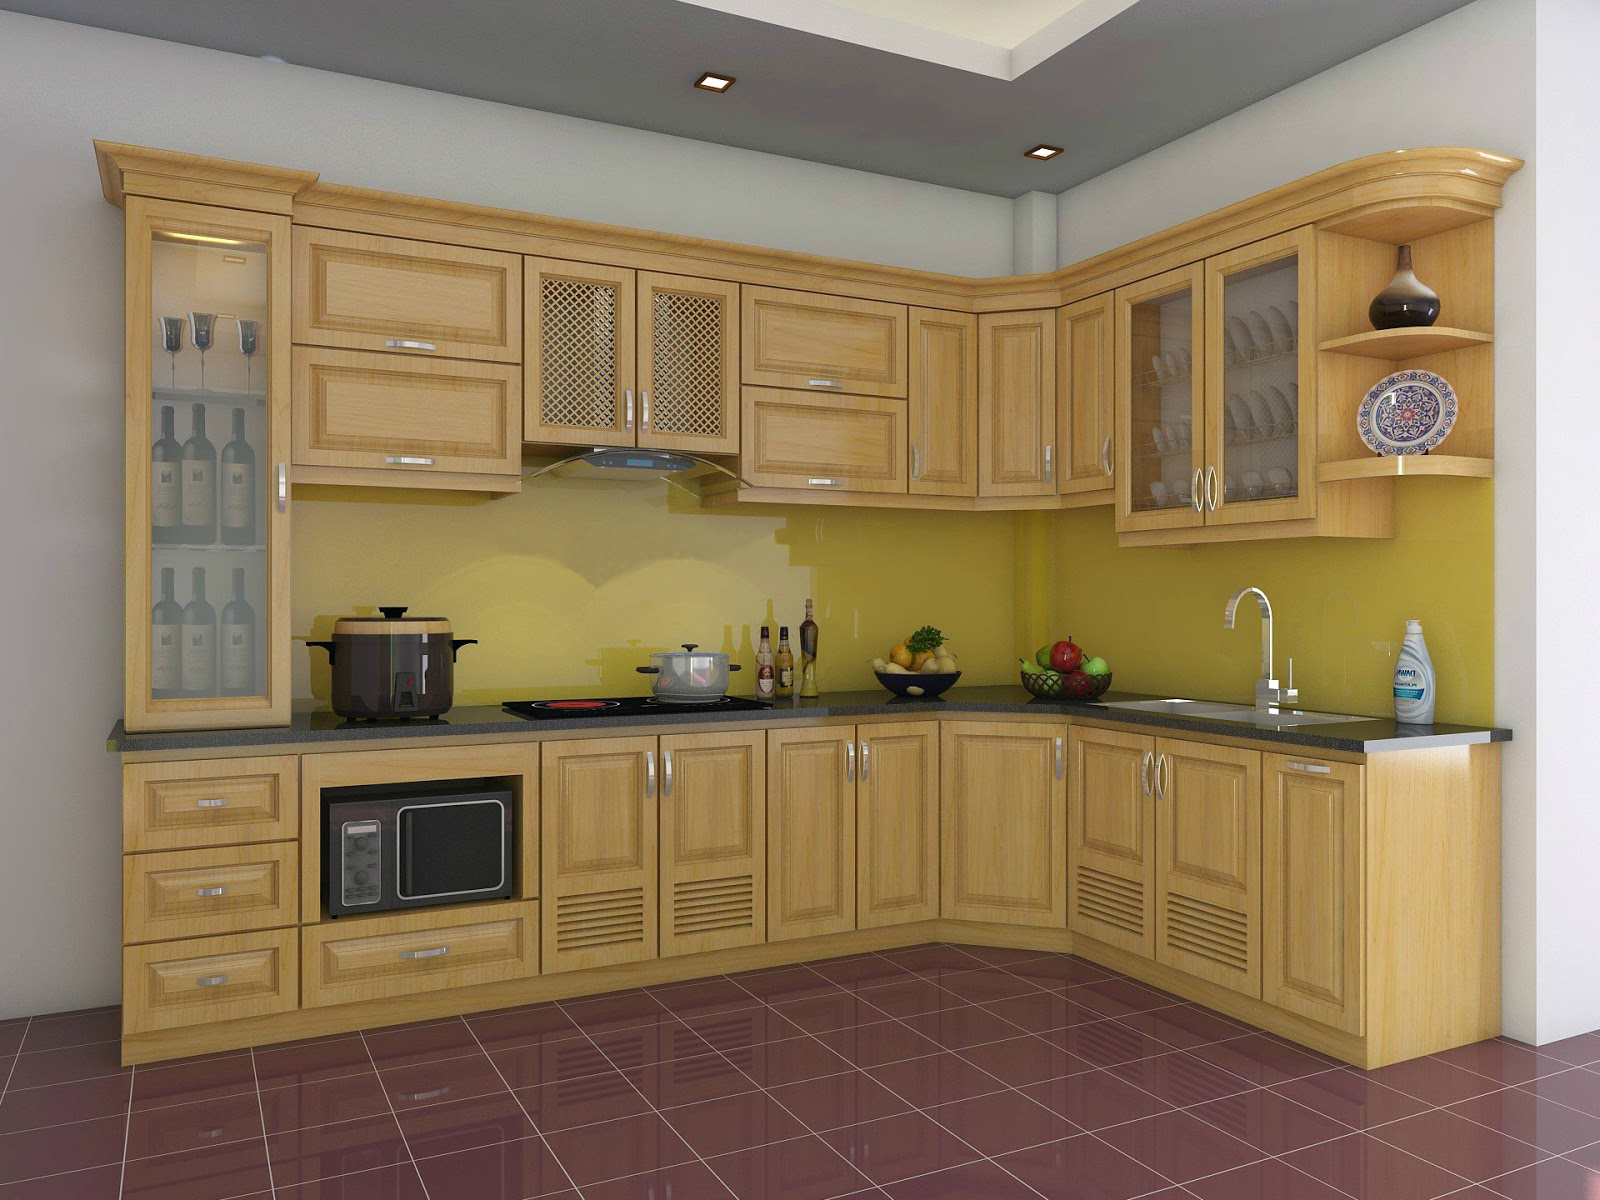 Tủ bếp gỗ sồi NHS-012